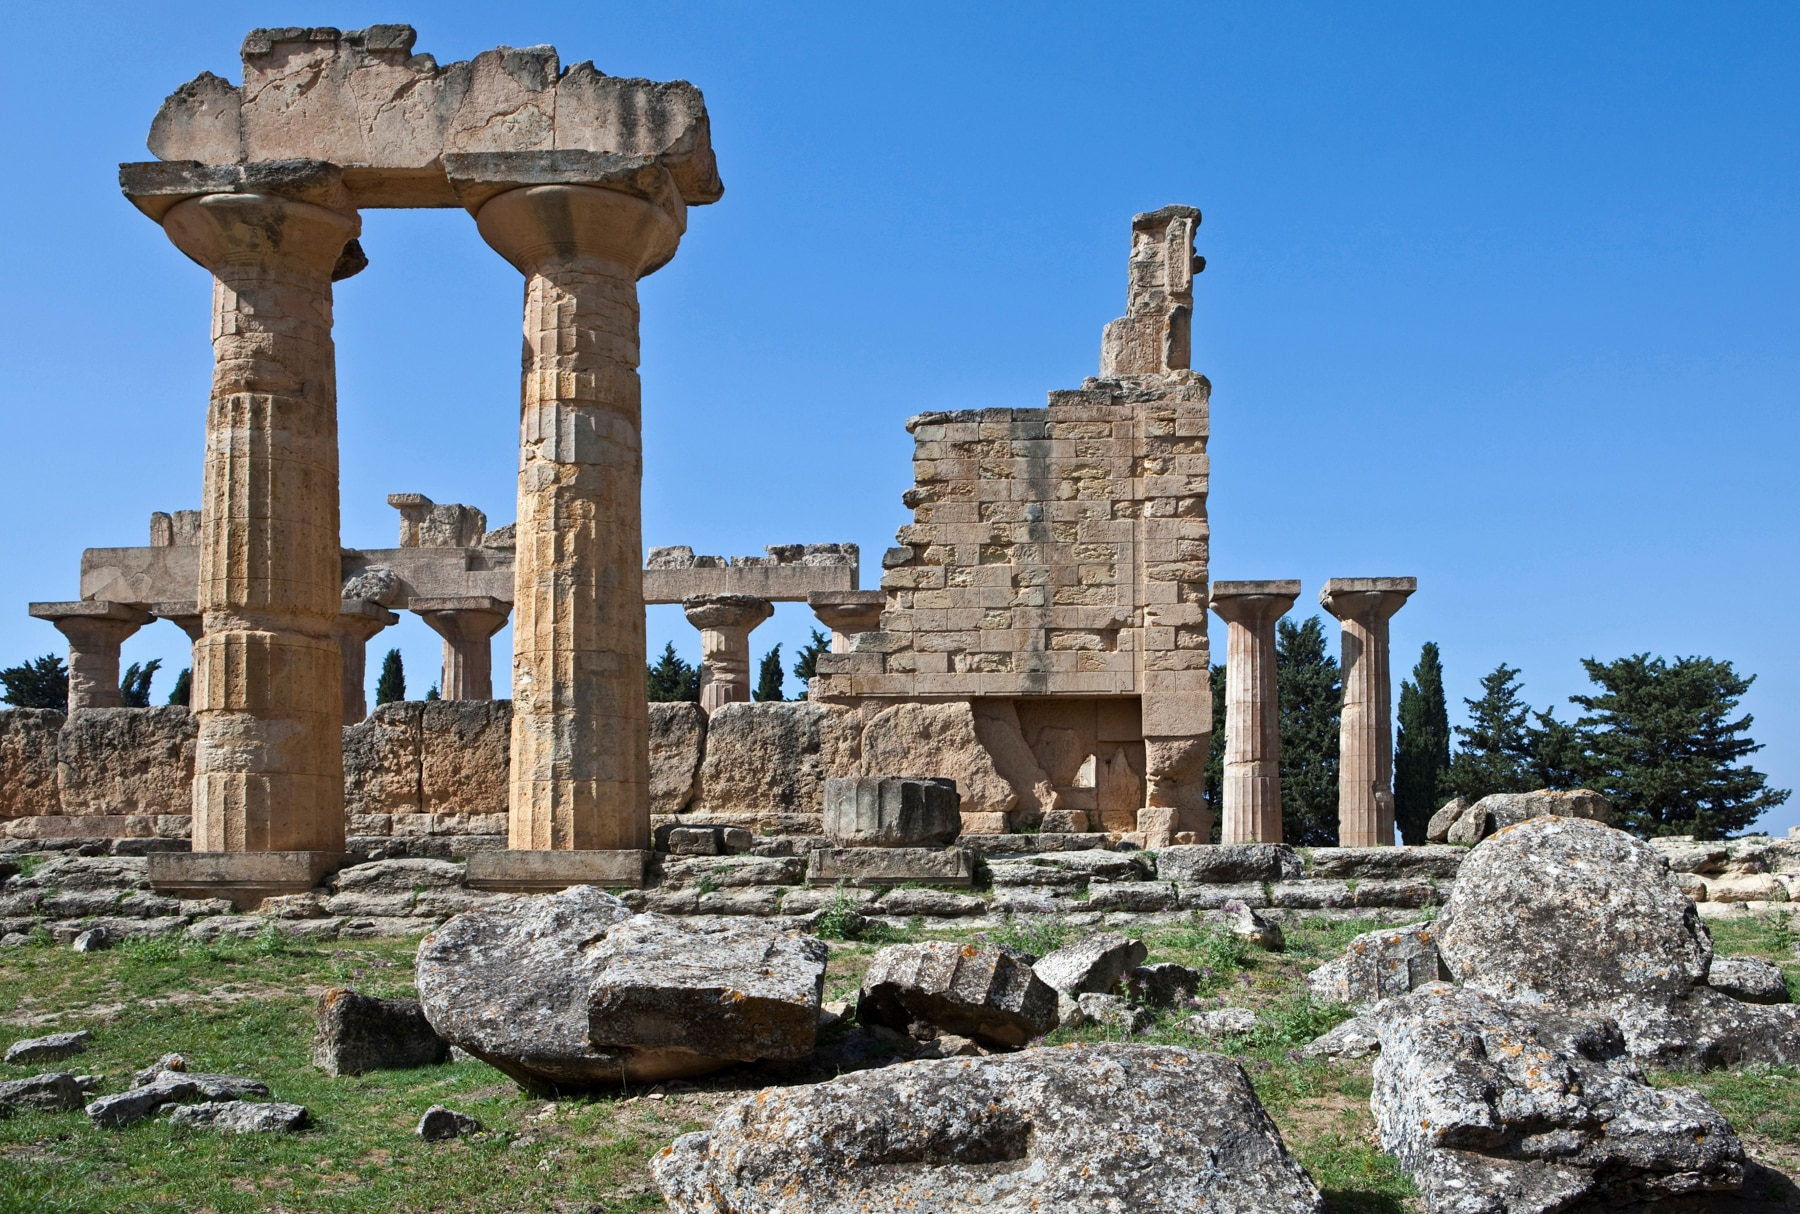 Paredes columnas y rocas fracturadas (© Giuseppe Masci/AGF/UIG/Getty Images)